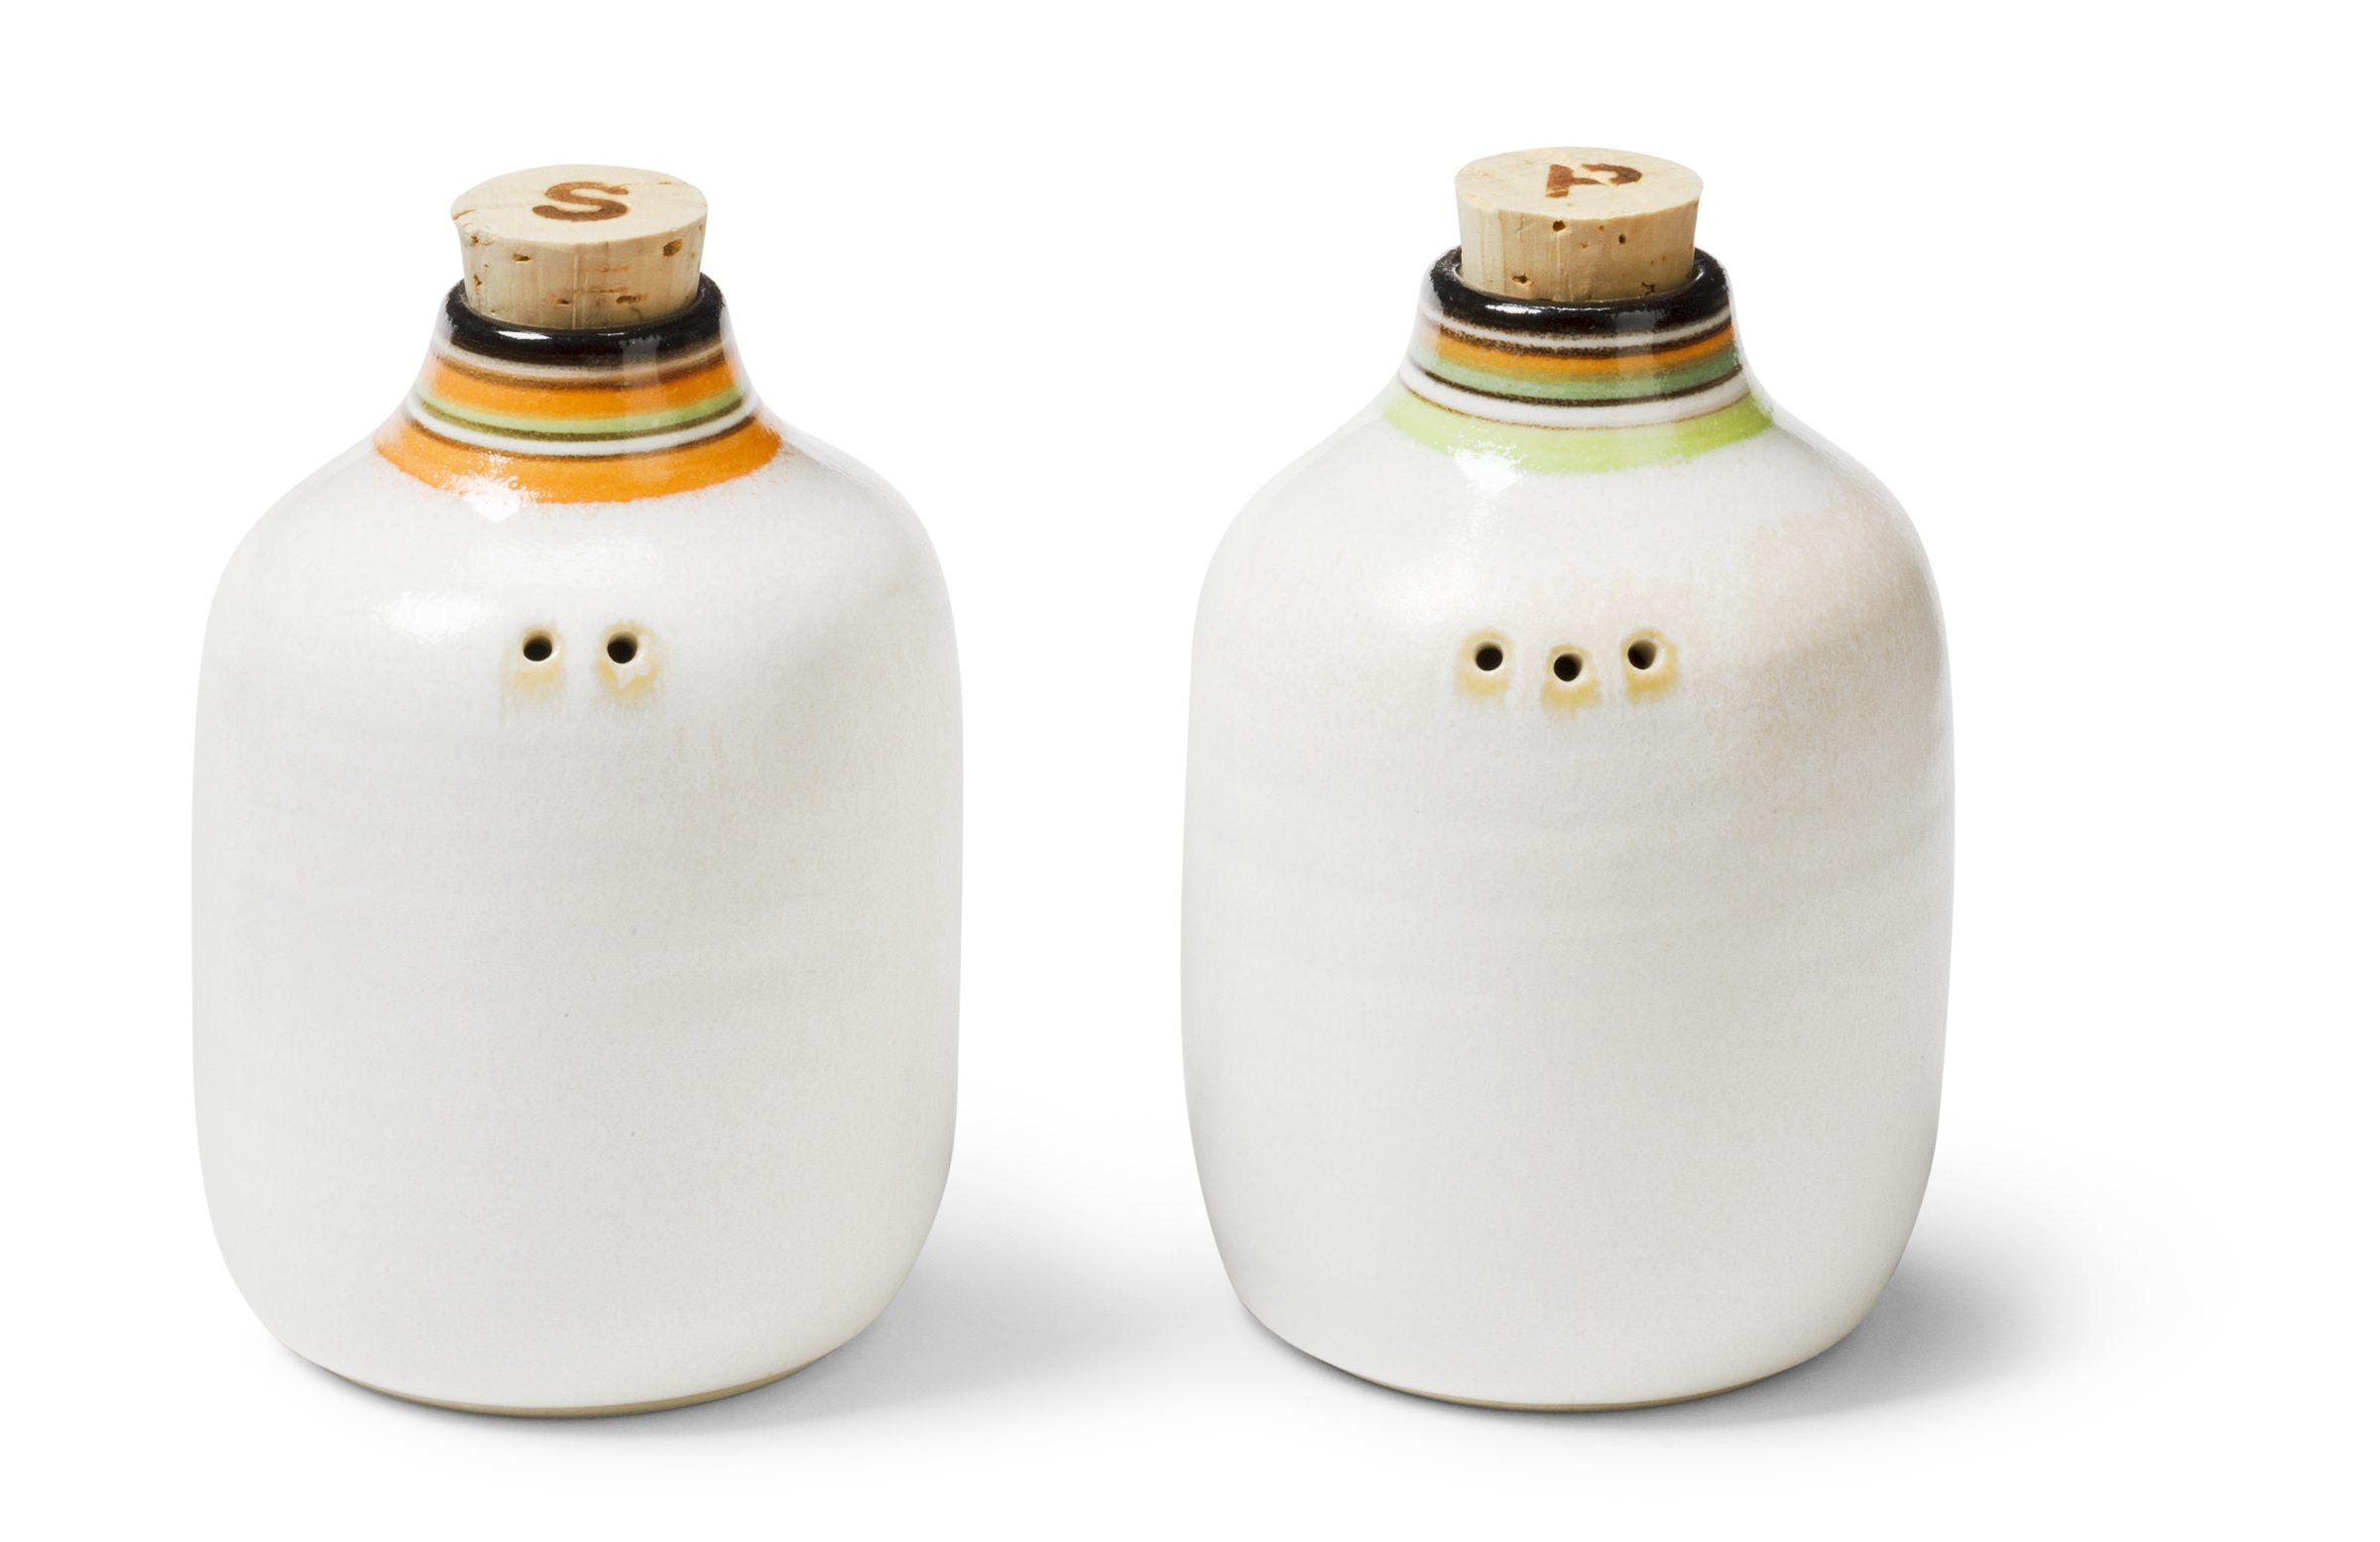 Porcelain salt and pepper shaker $35 each by Hae Jin Lee, Haejin Lee Ceramics